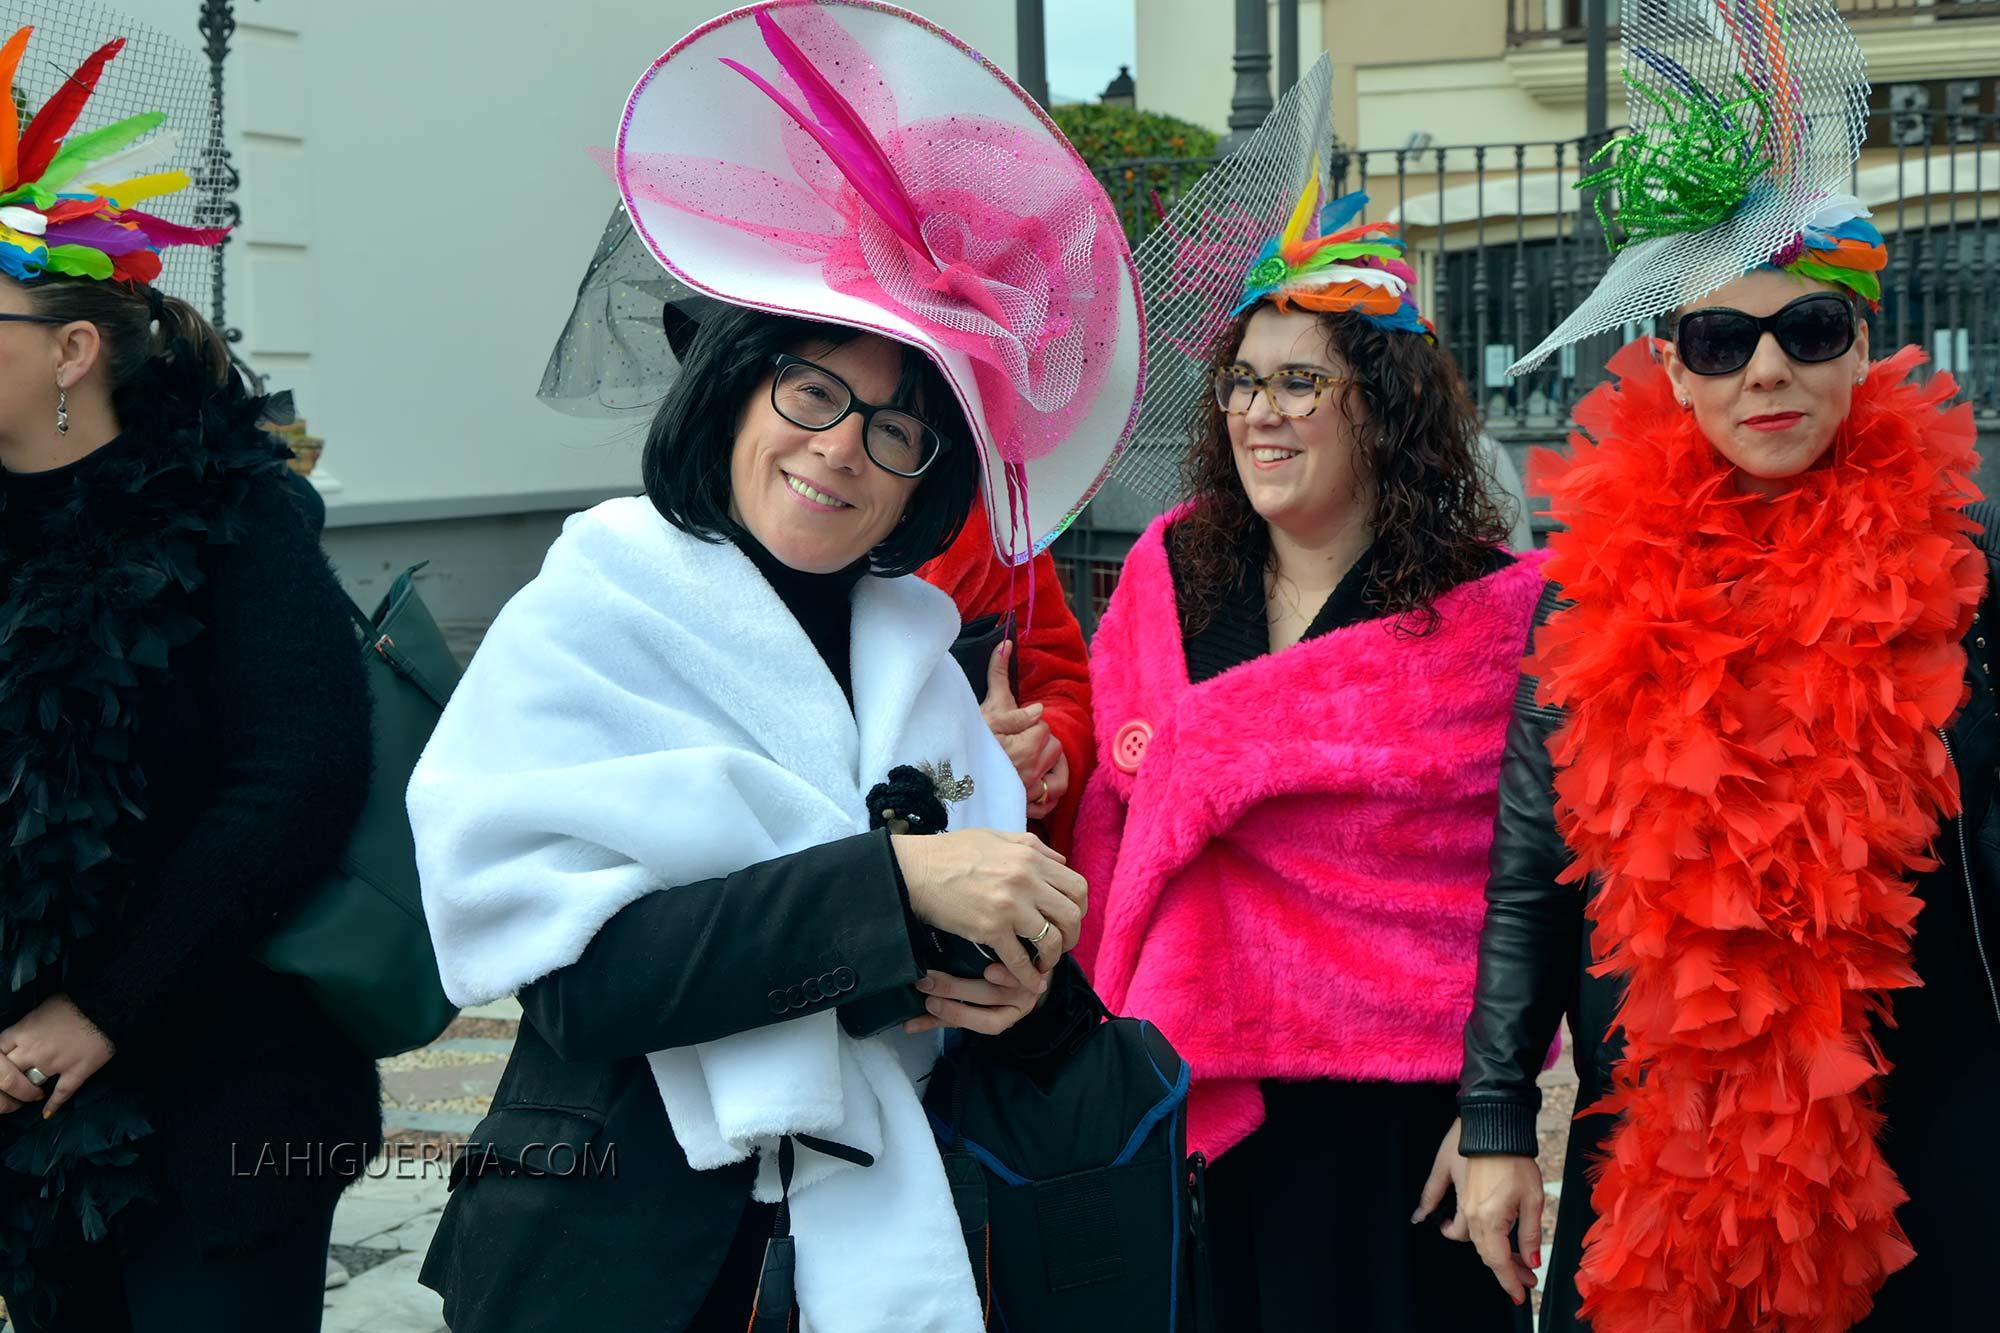 Cabalgata infantil de viudas carnaval de Isla cristina 2016 _DSC1812